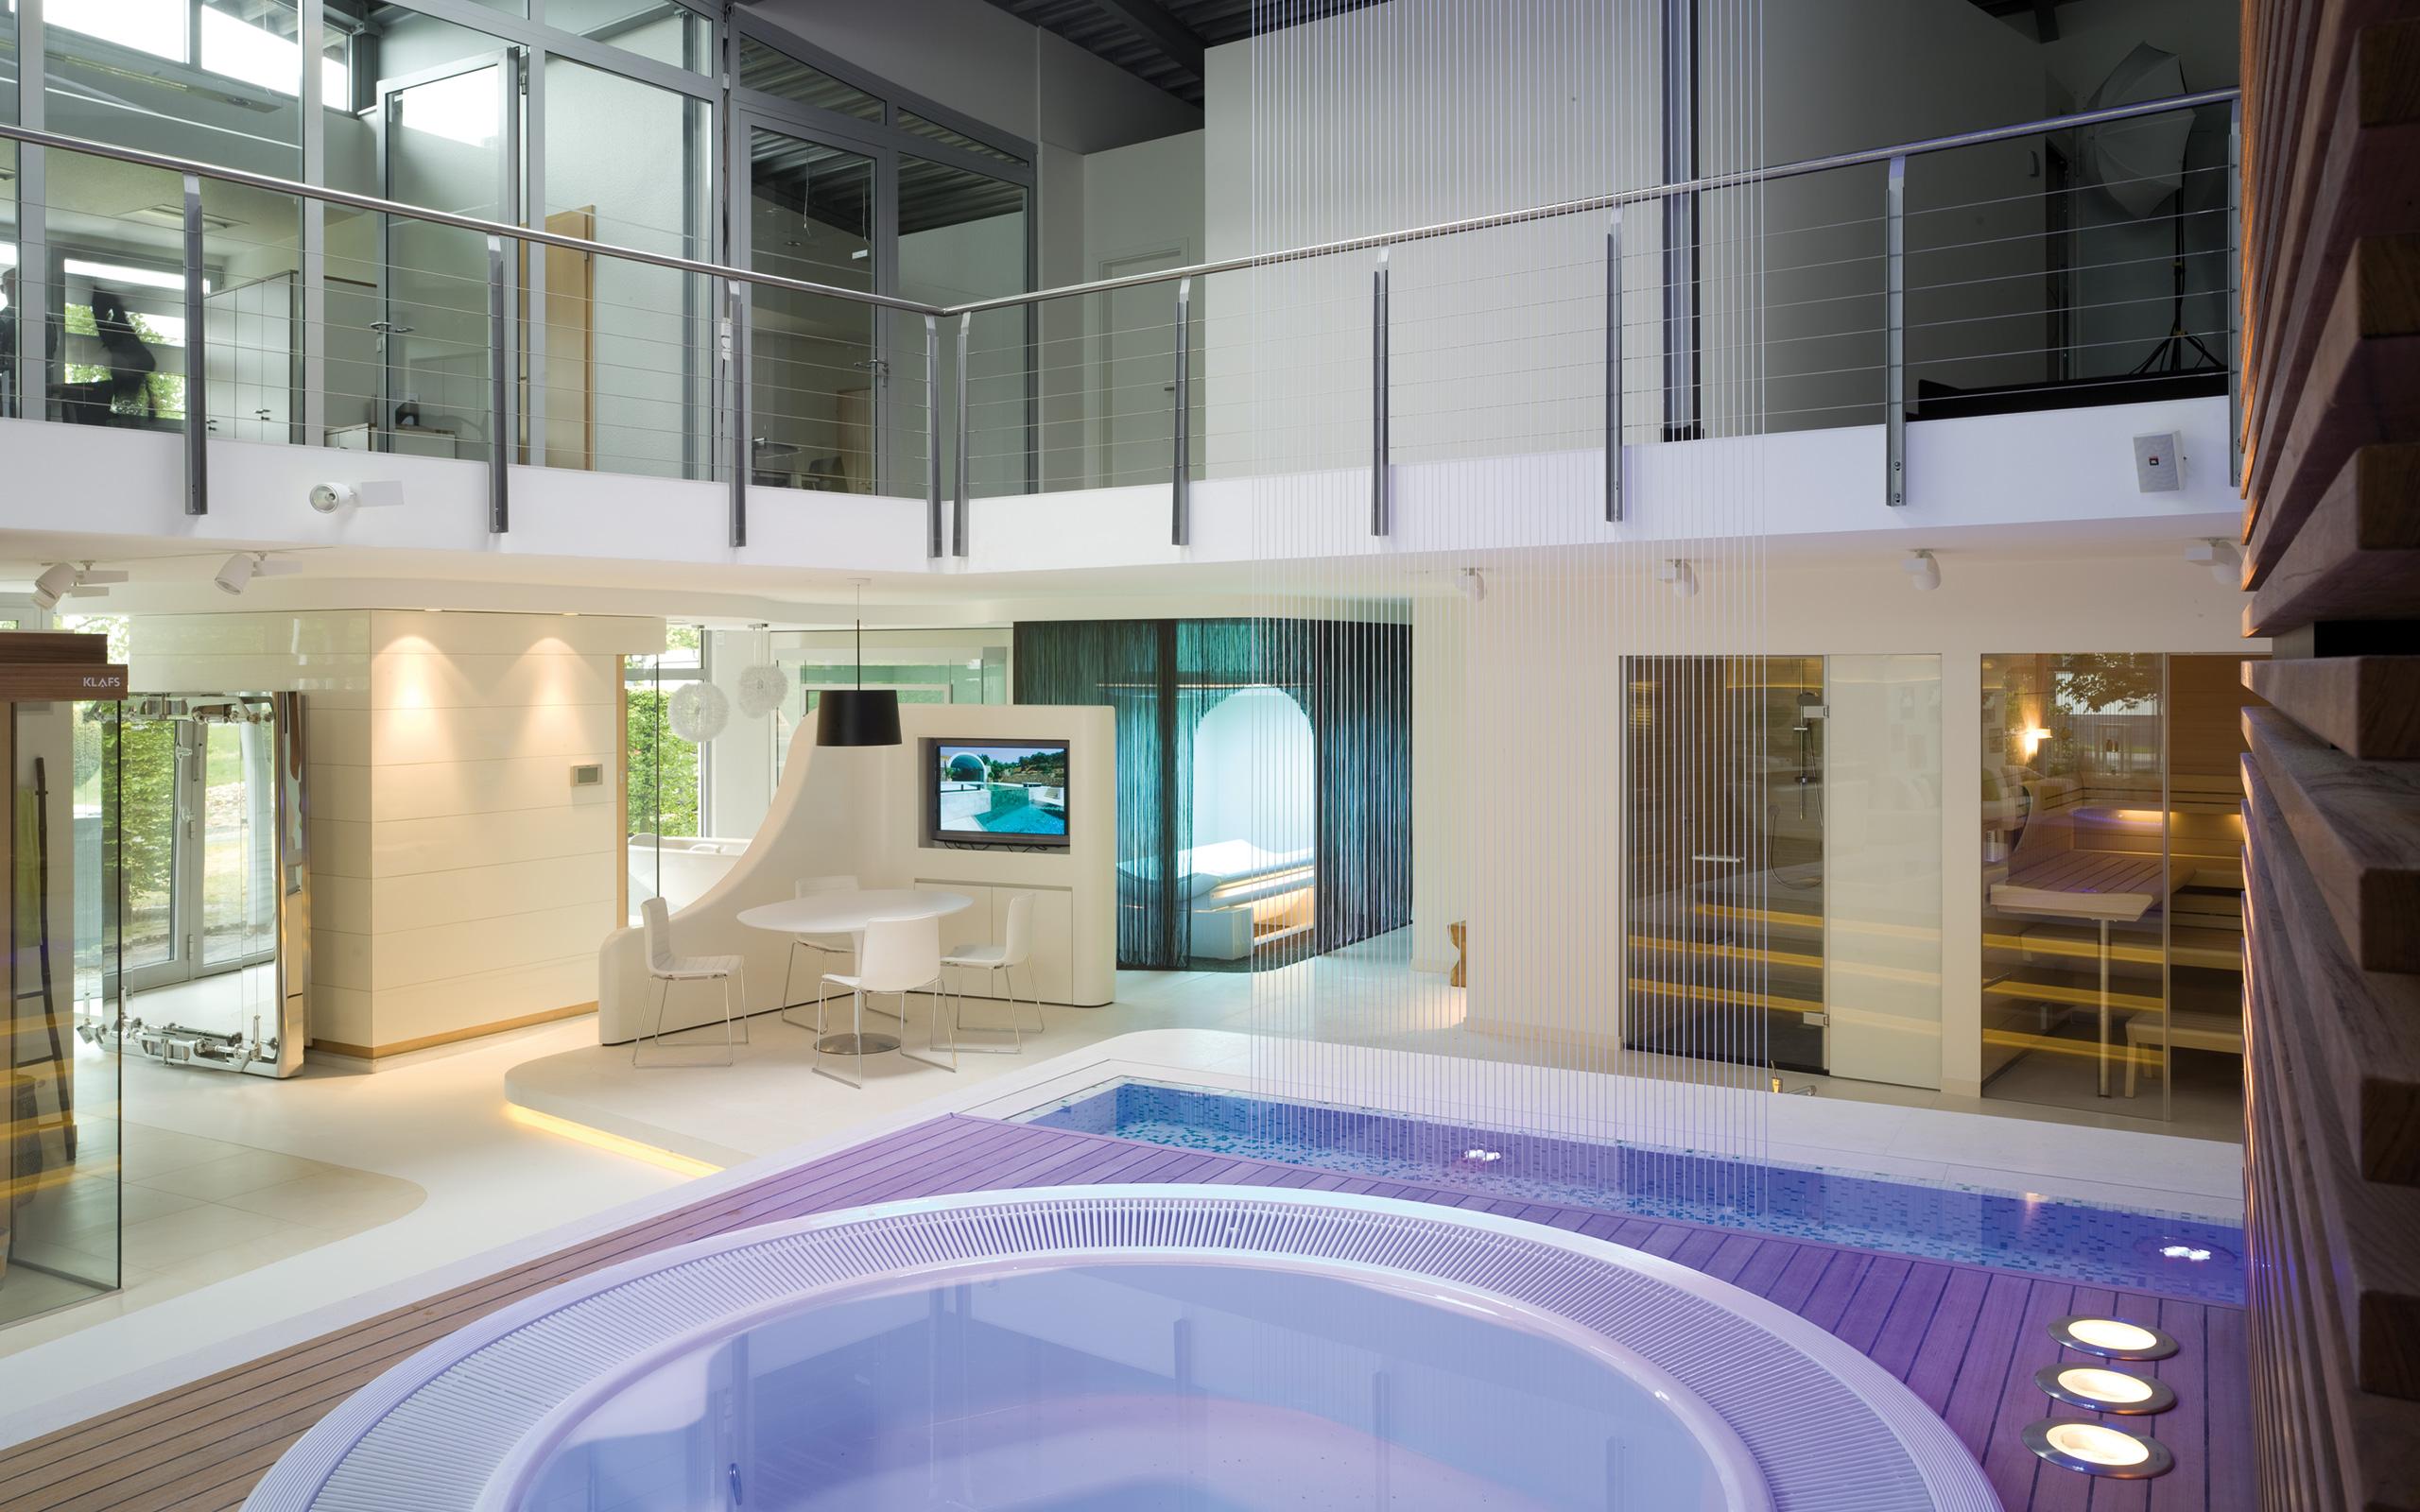 schwimmbad und pool ausstellung in meerbusch ssf pools. Black Bedroom Furniture Sets. Home Design Ideas